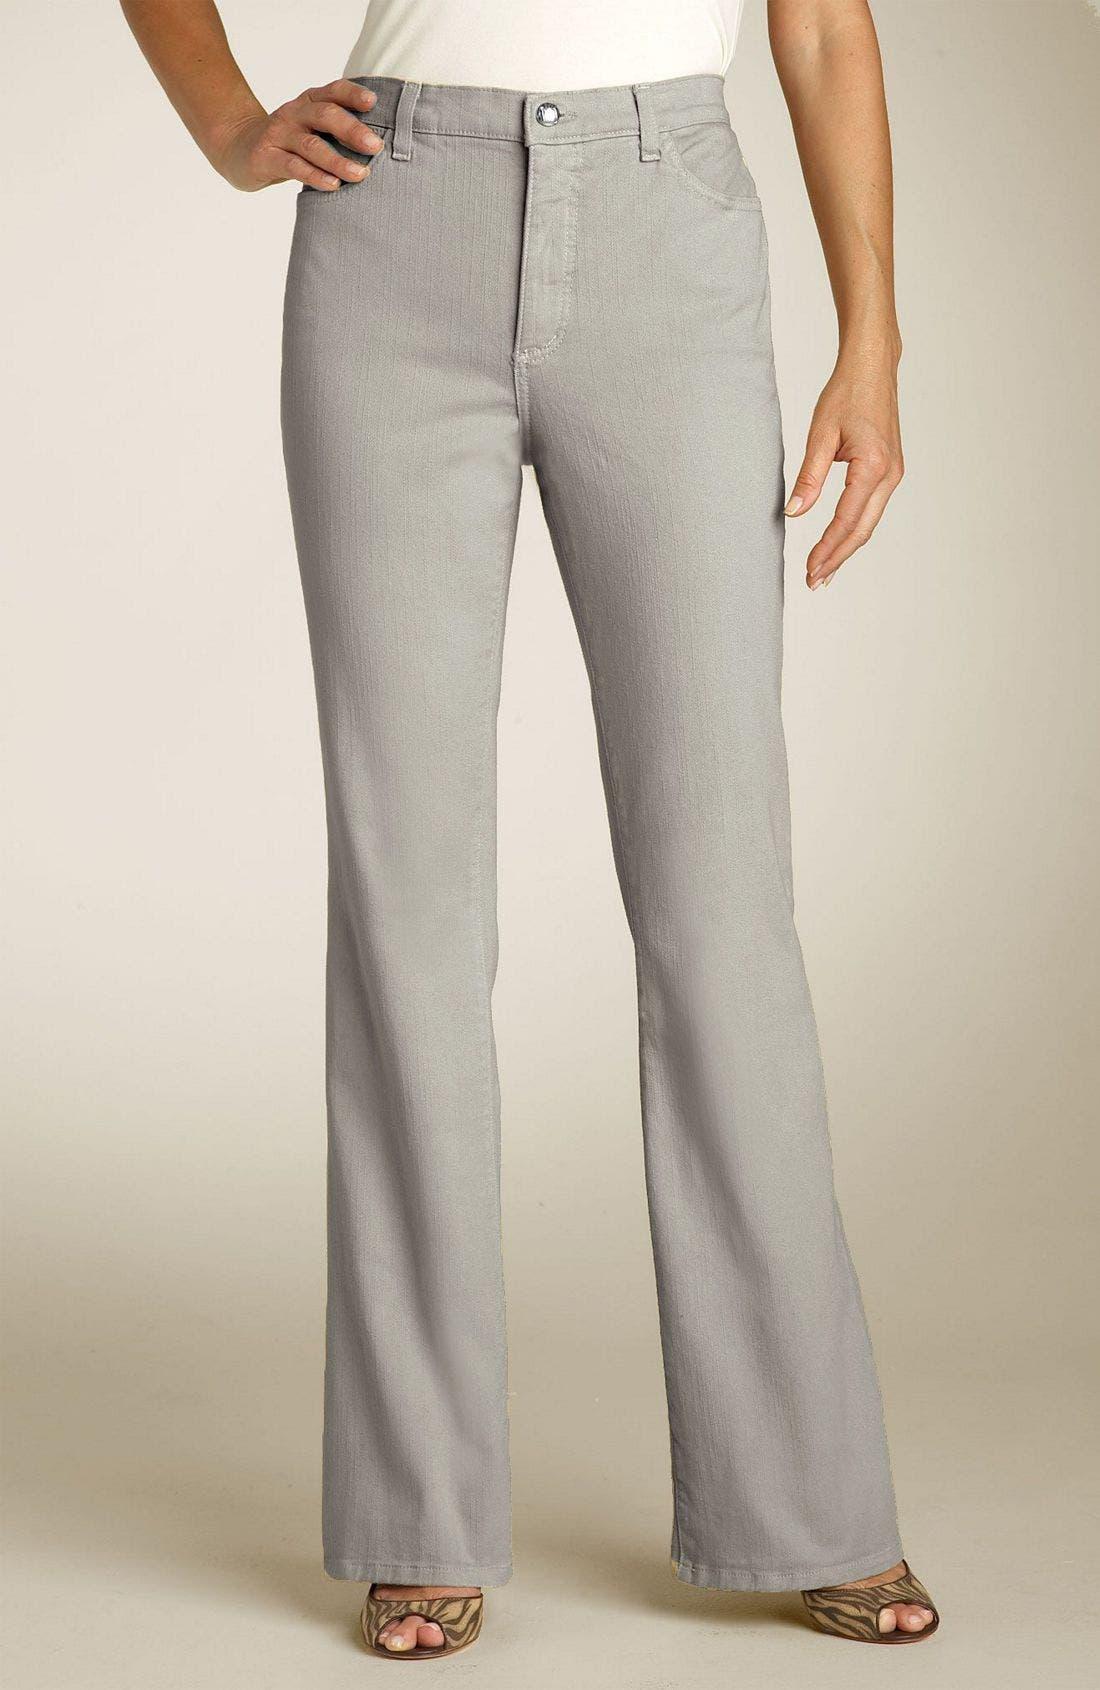 'Sarah' Stretch Bootcut Jeans,                             Main thumbnail 1, color,                             059